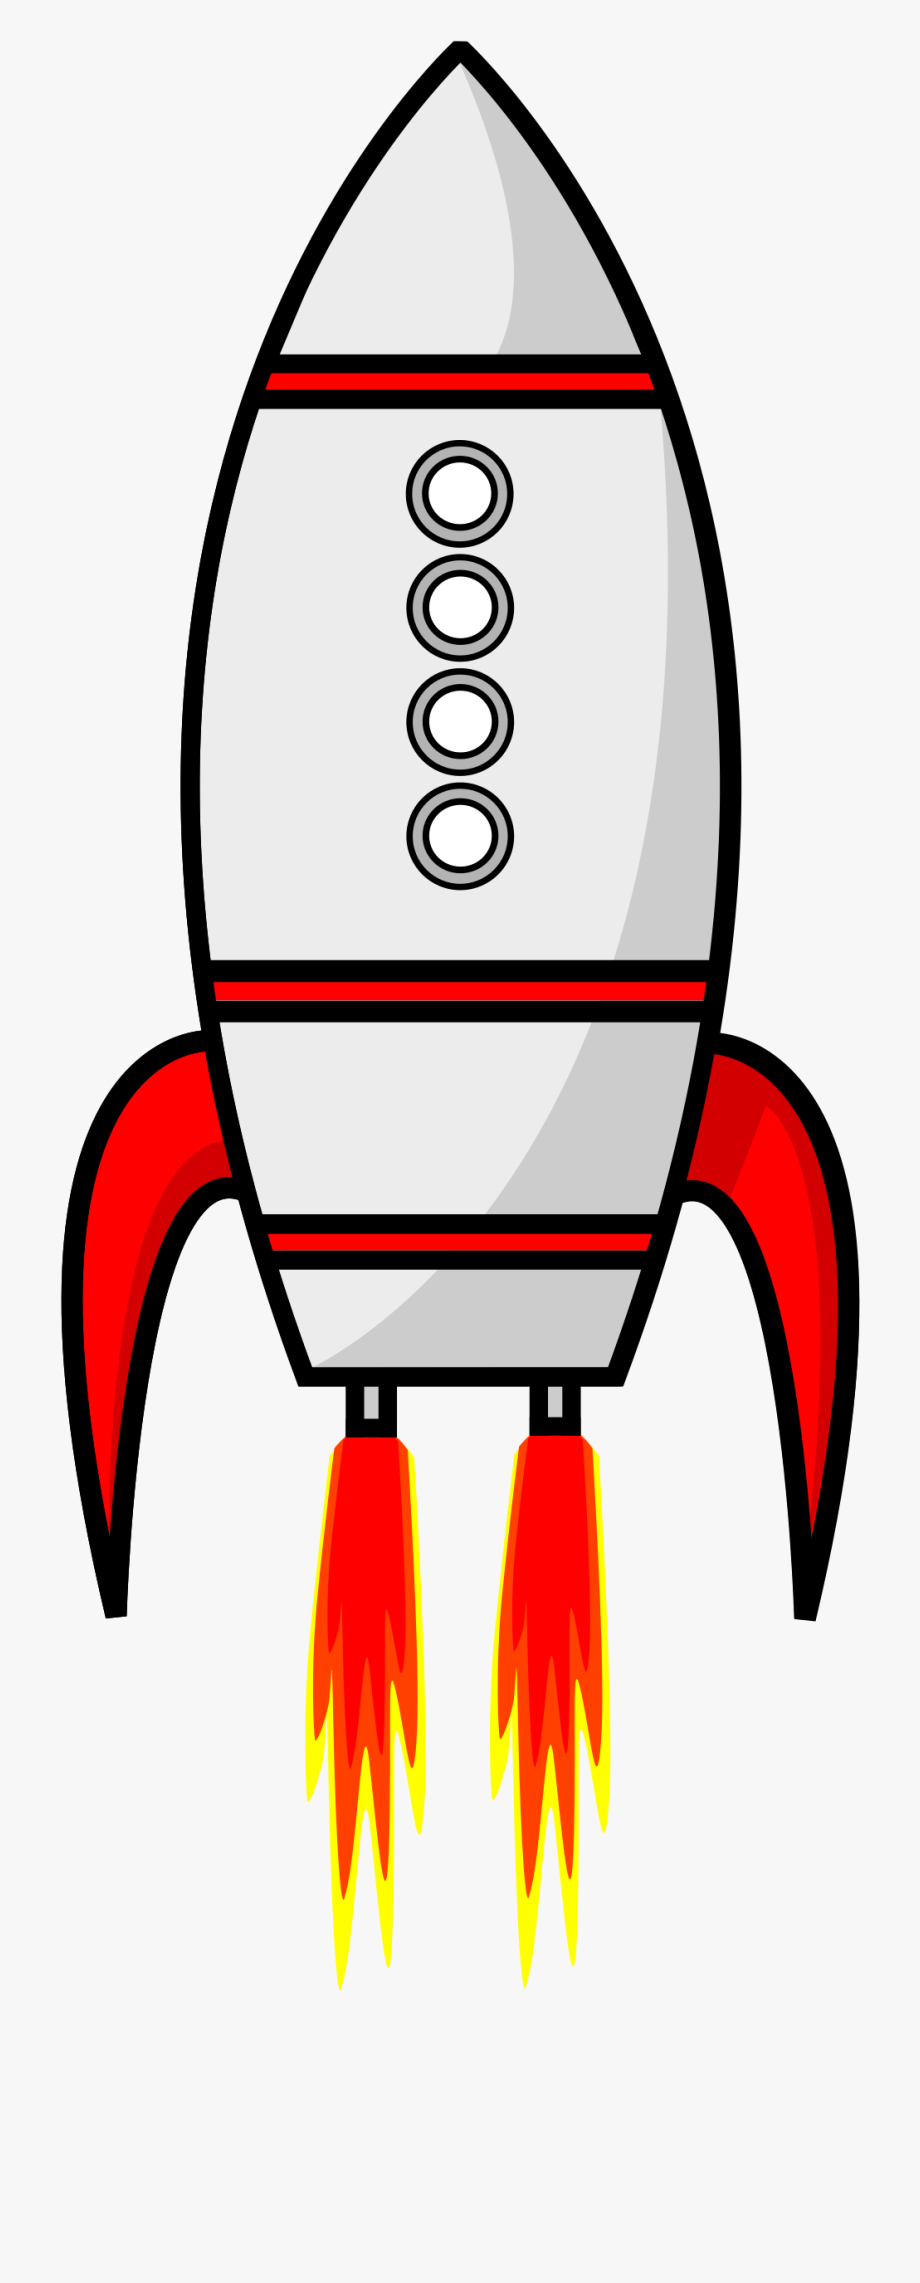 Moon remix cartoon ship. Clipart rocket ricket